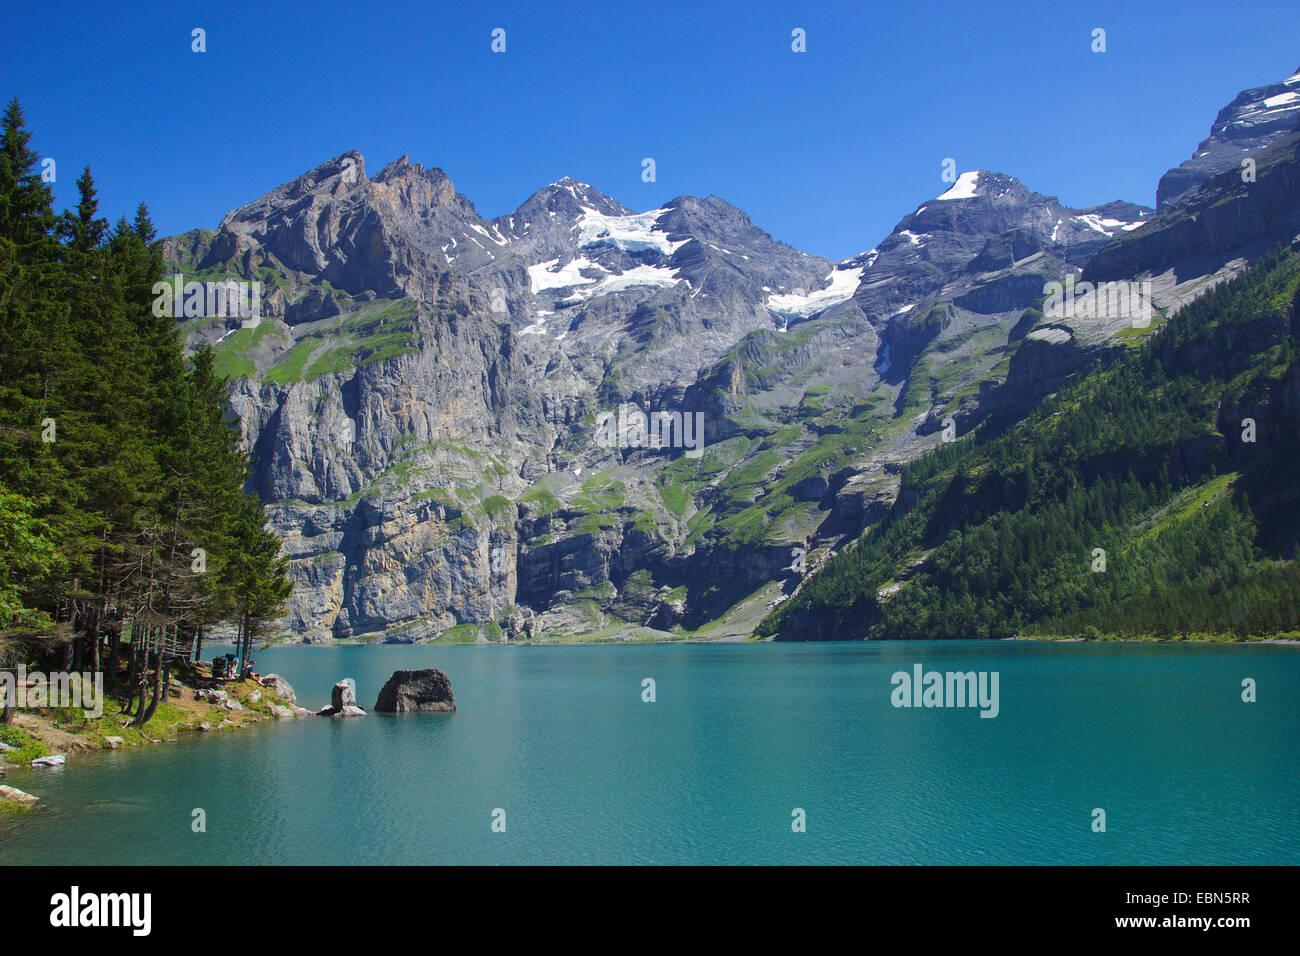 lake Oeschinen near Kandersteg with Bluemlisalp, Switzerland - Stock Image